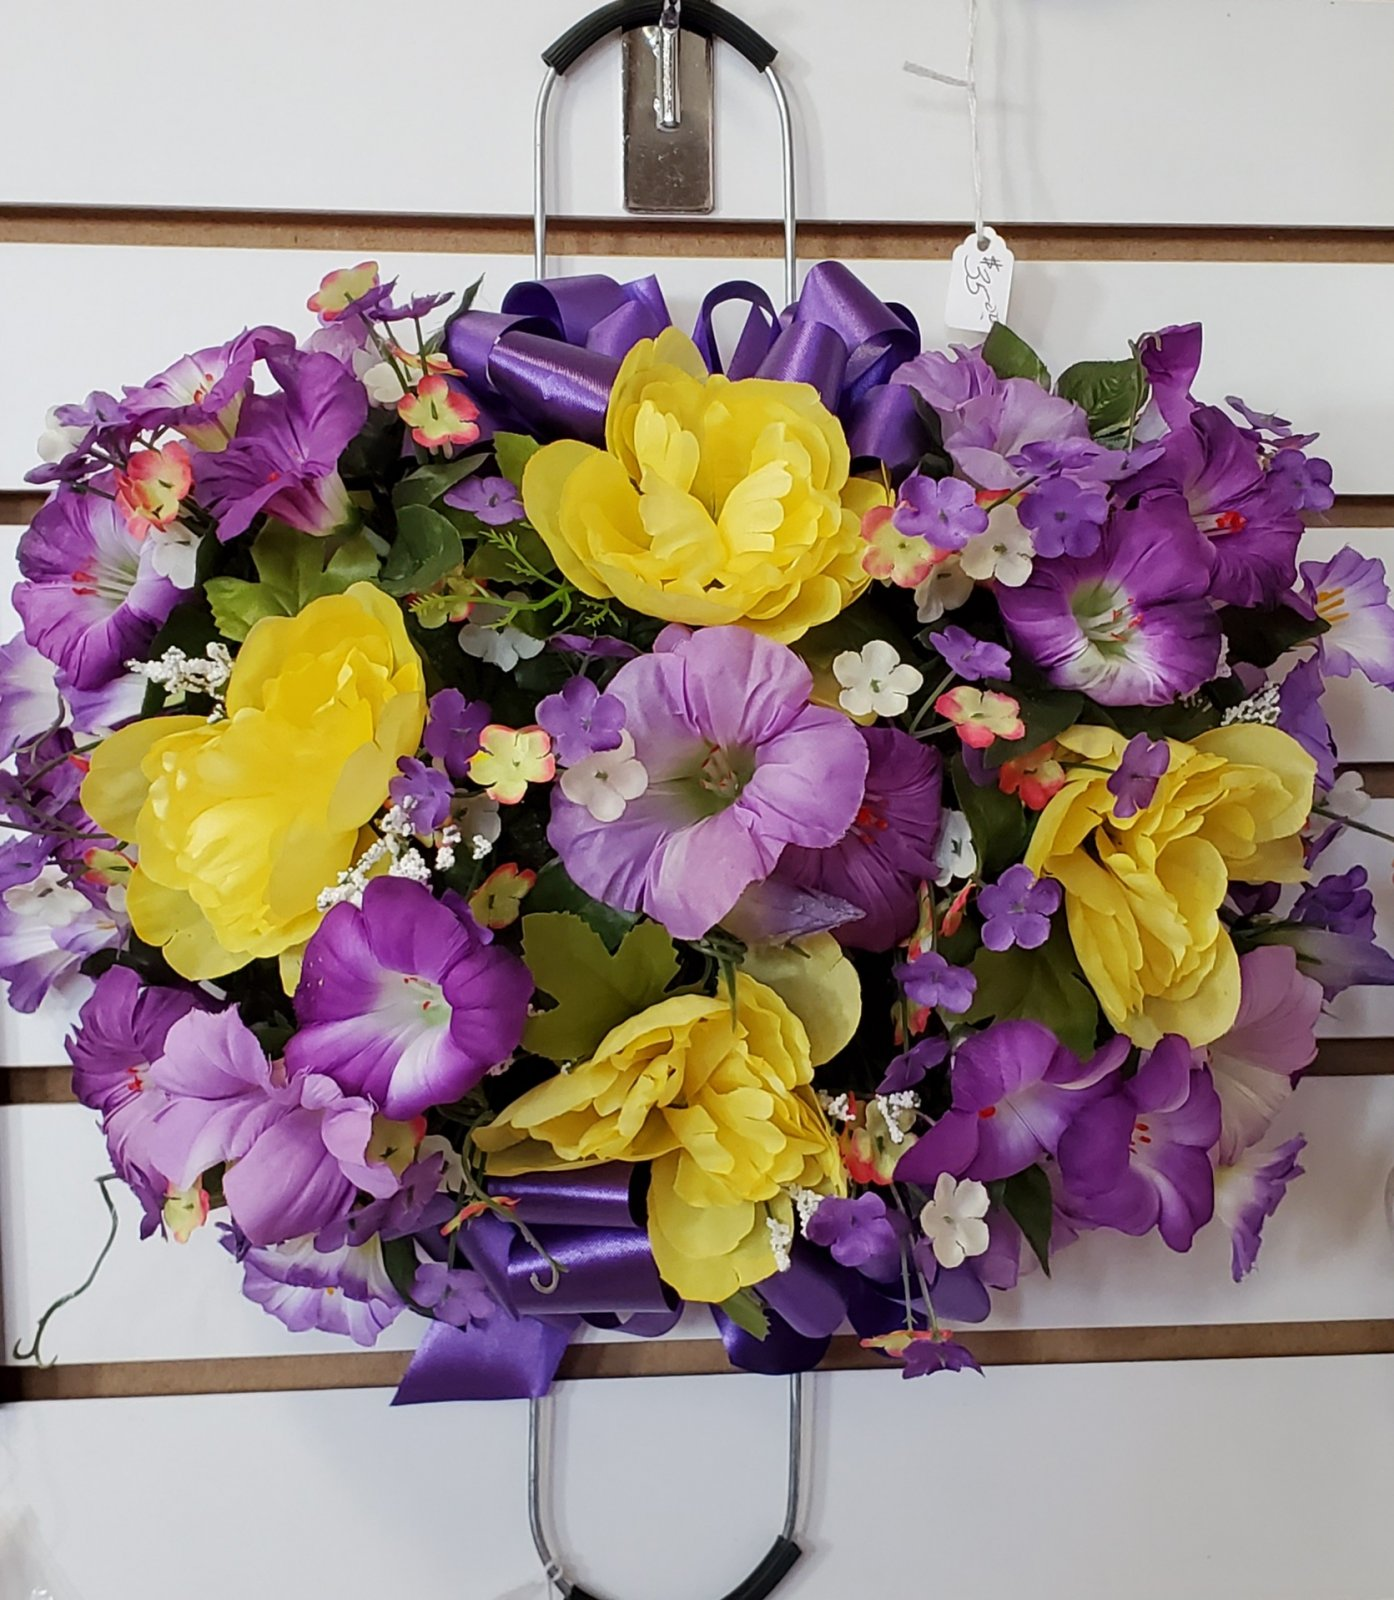 Small memorial grave stone saddle -purple/yellow